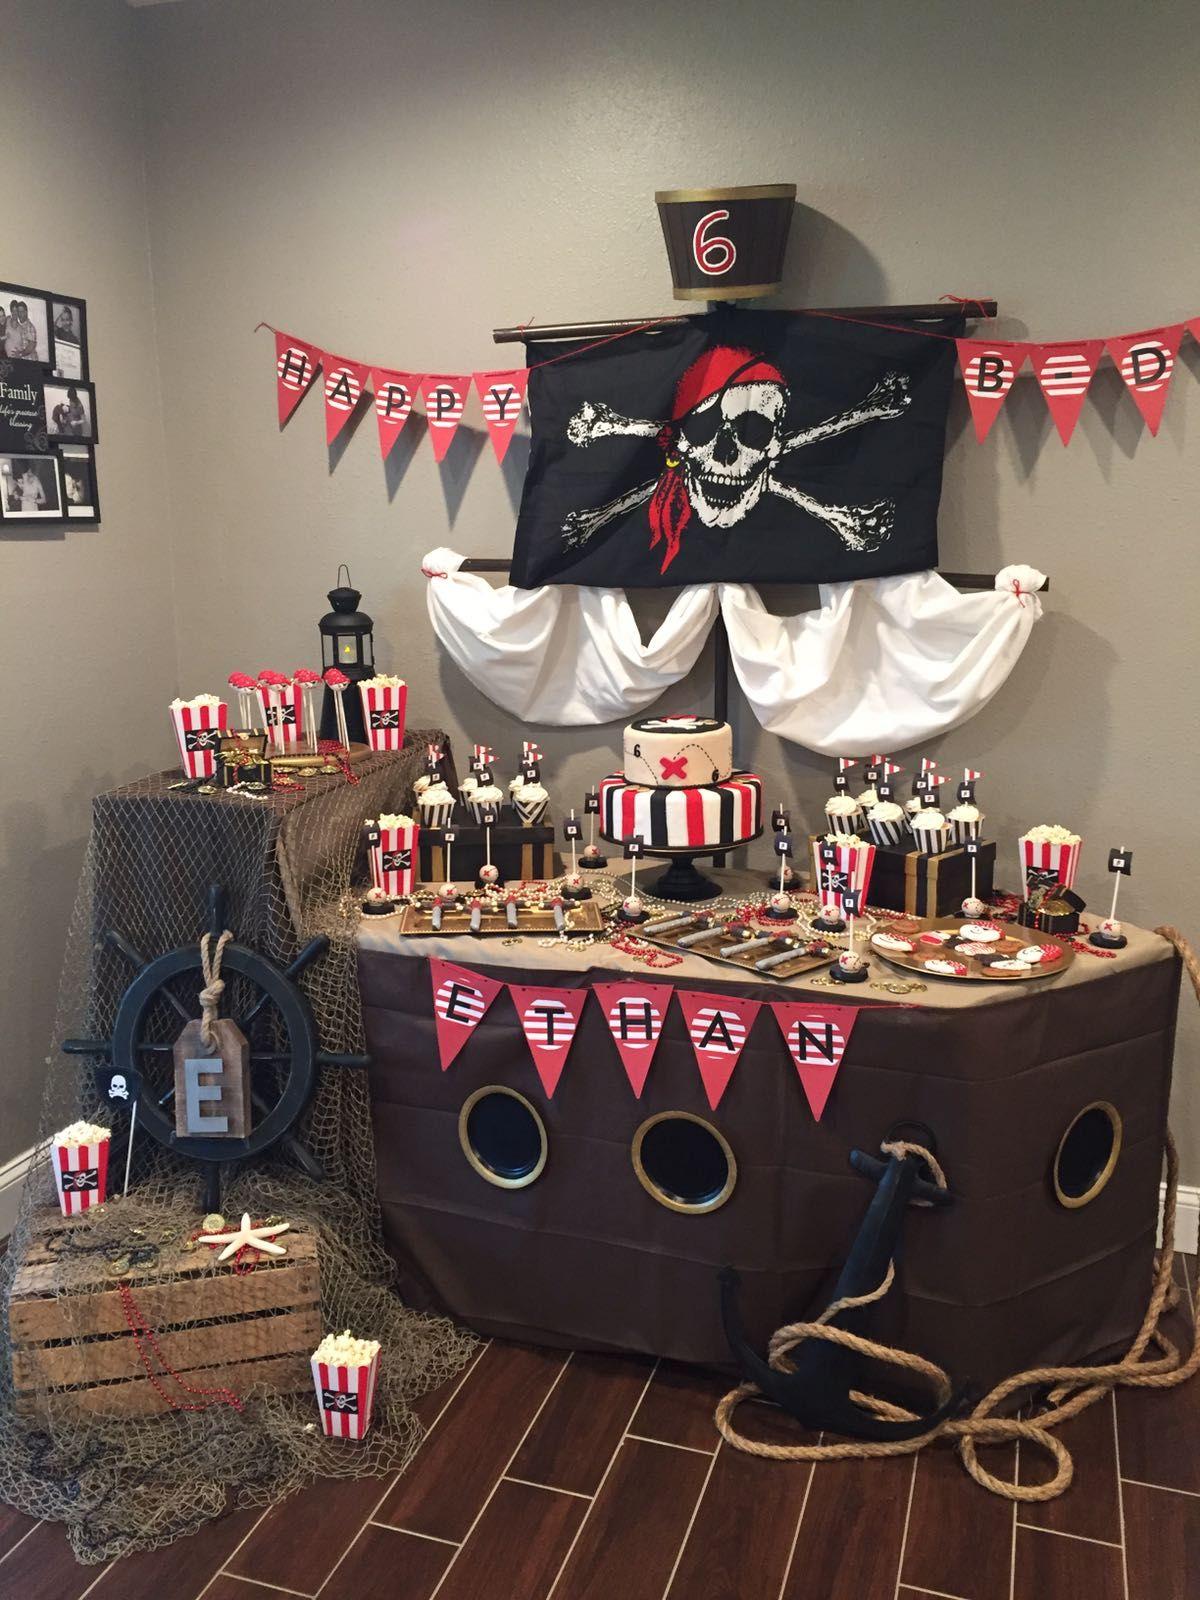 Pirate Ship Table Decoration Anniversaire Pirate Anniversaire Decopirate Pirat Pirate Themed Birthday Party Pirate Birthday Party Pirate Party Decorations